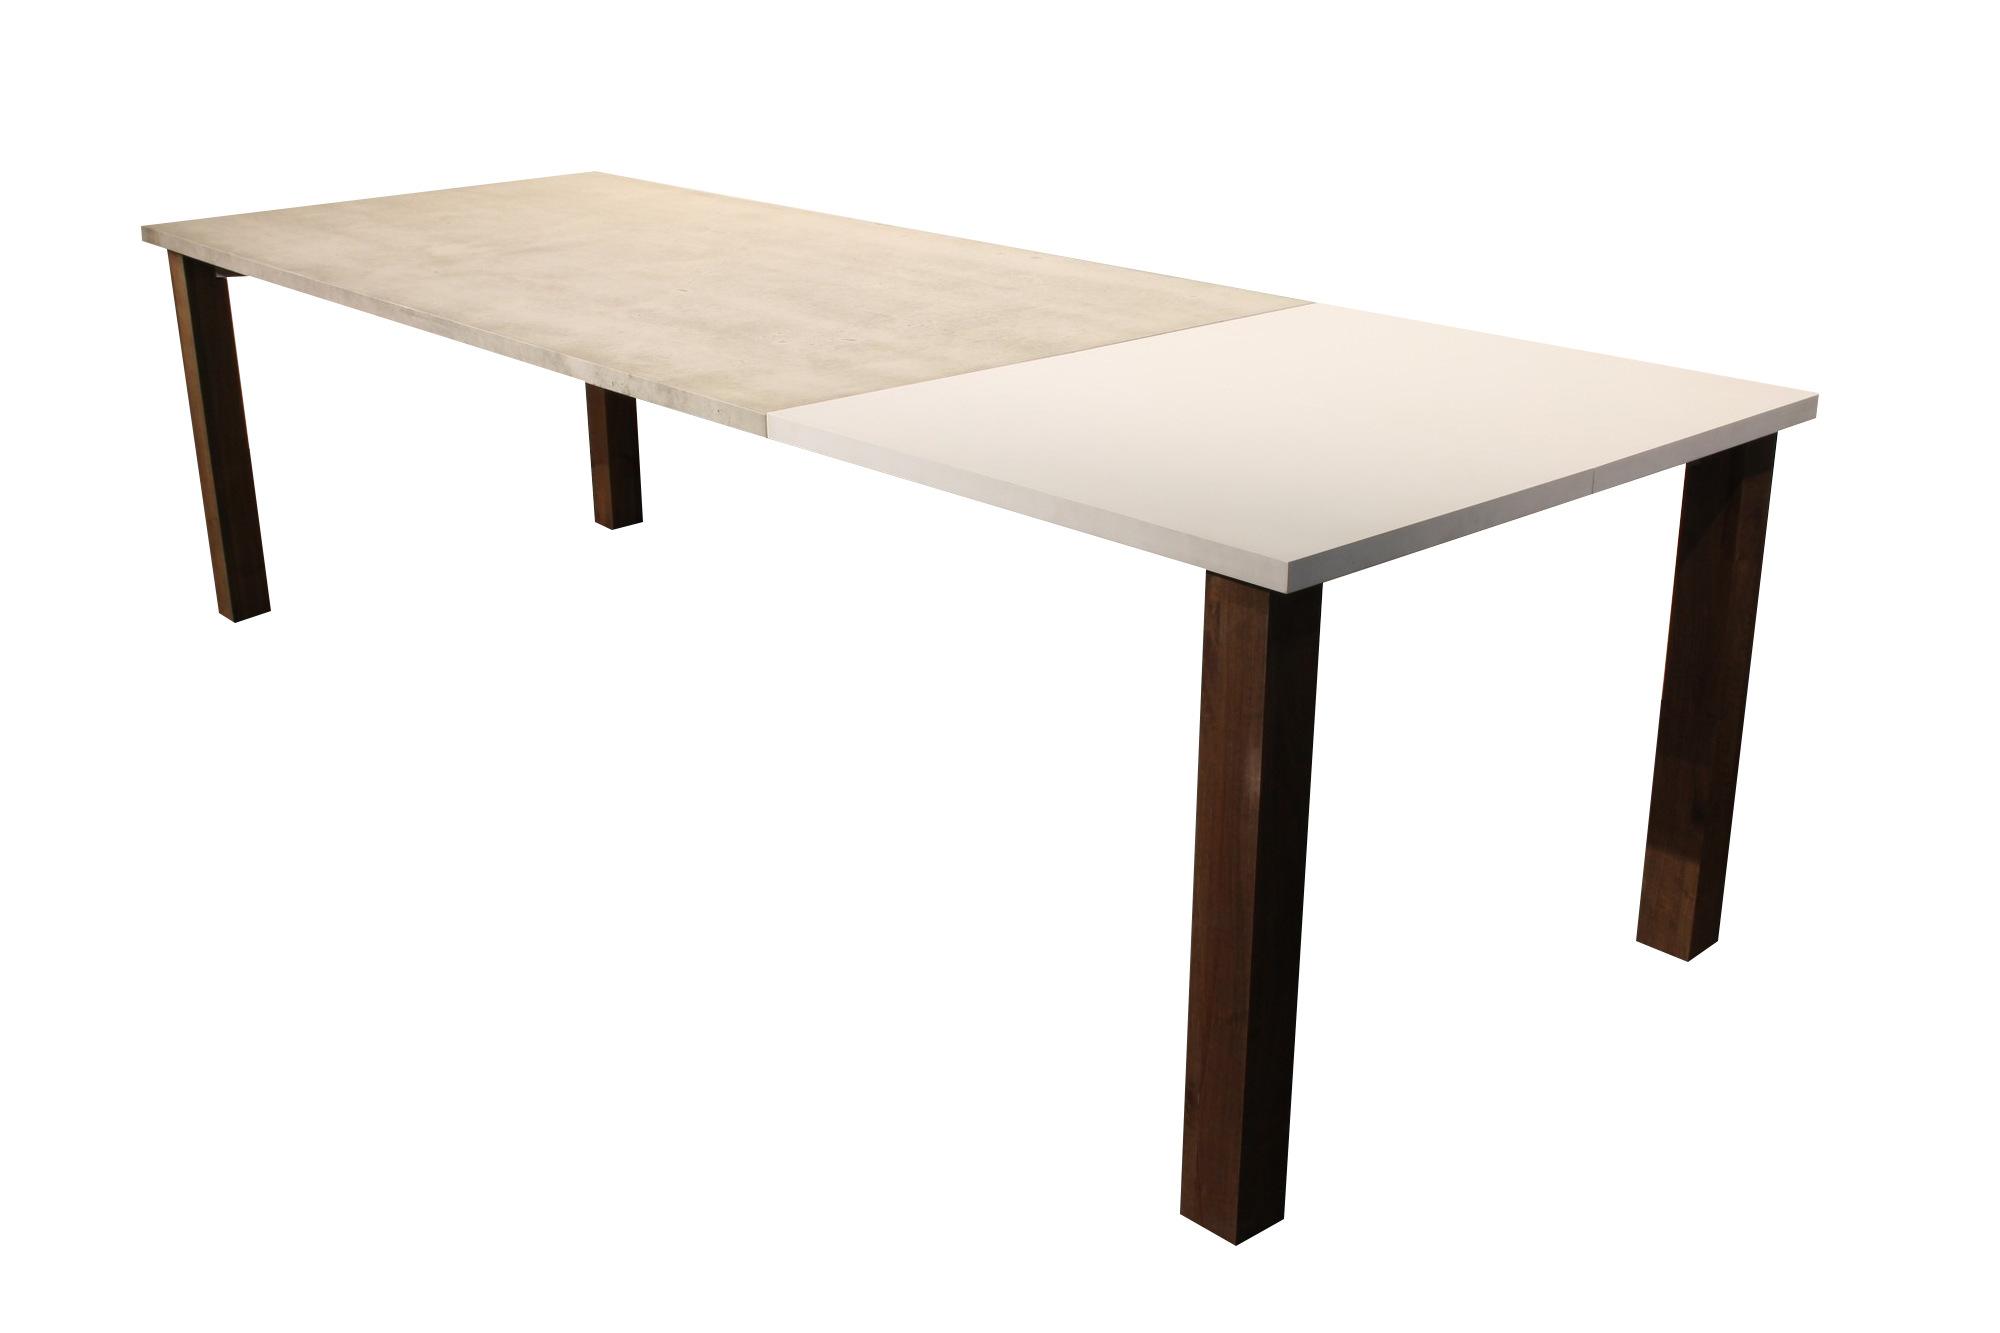 1501053881-essen-auszugtisch-casa-uno-betonoptik-20080-x-100-cm.jpg